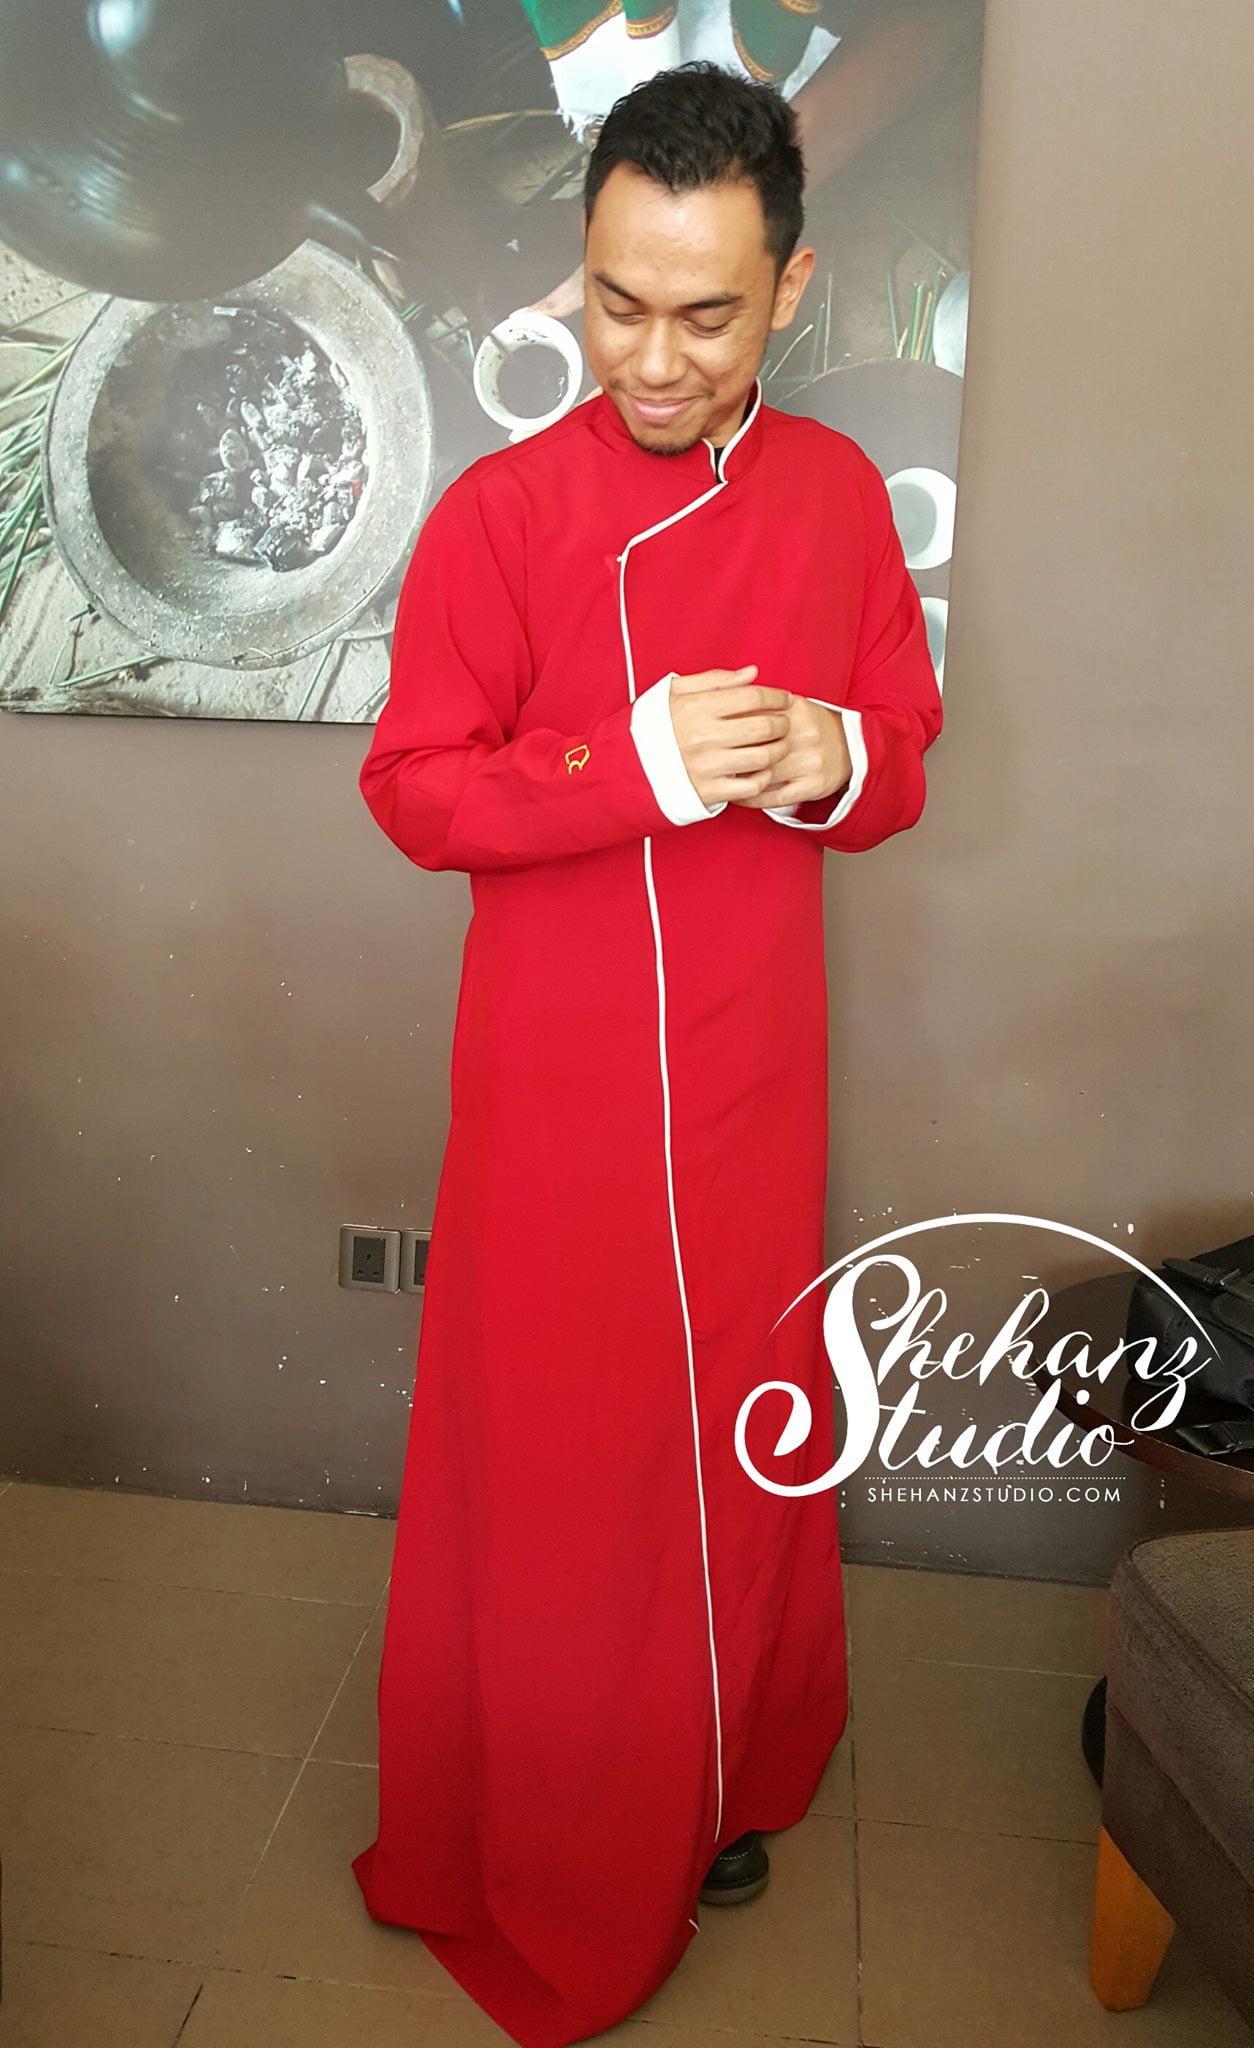 gambar baju raya lelaki 2016 cantik dunia farisya jubah moden gambar di rebanas rebanas. Black Bedroom Furniture Sets. Home Design Ideas